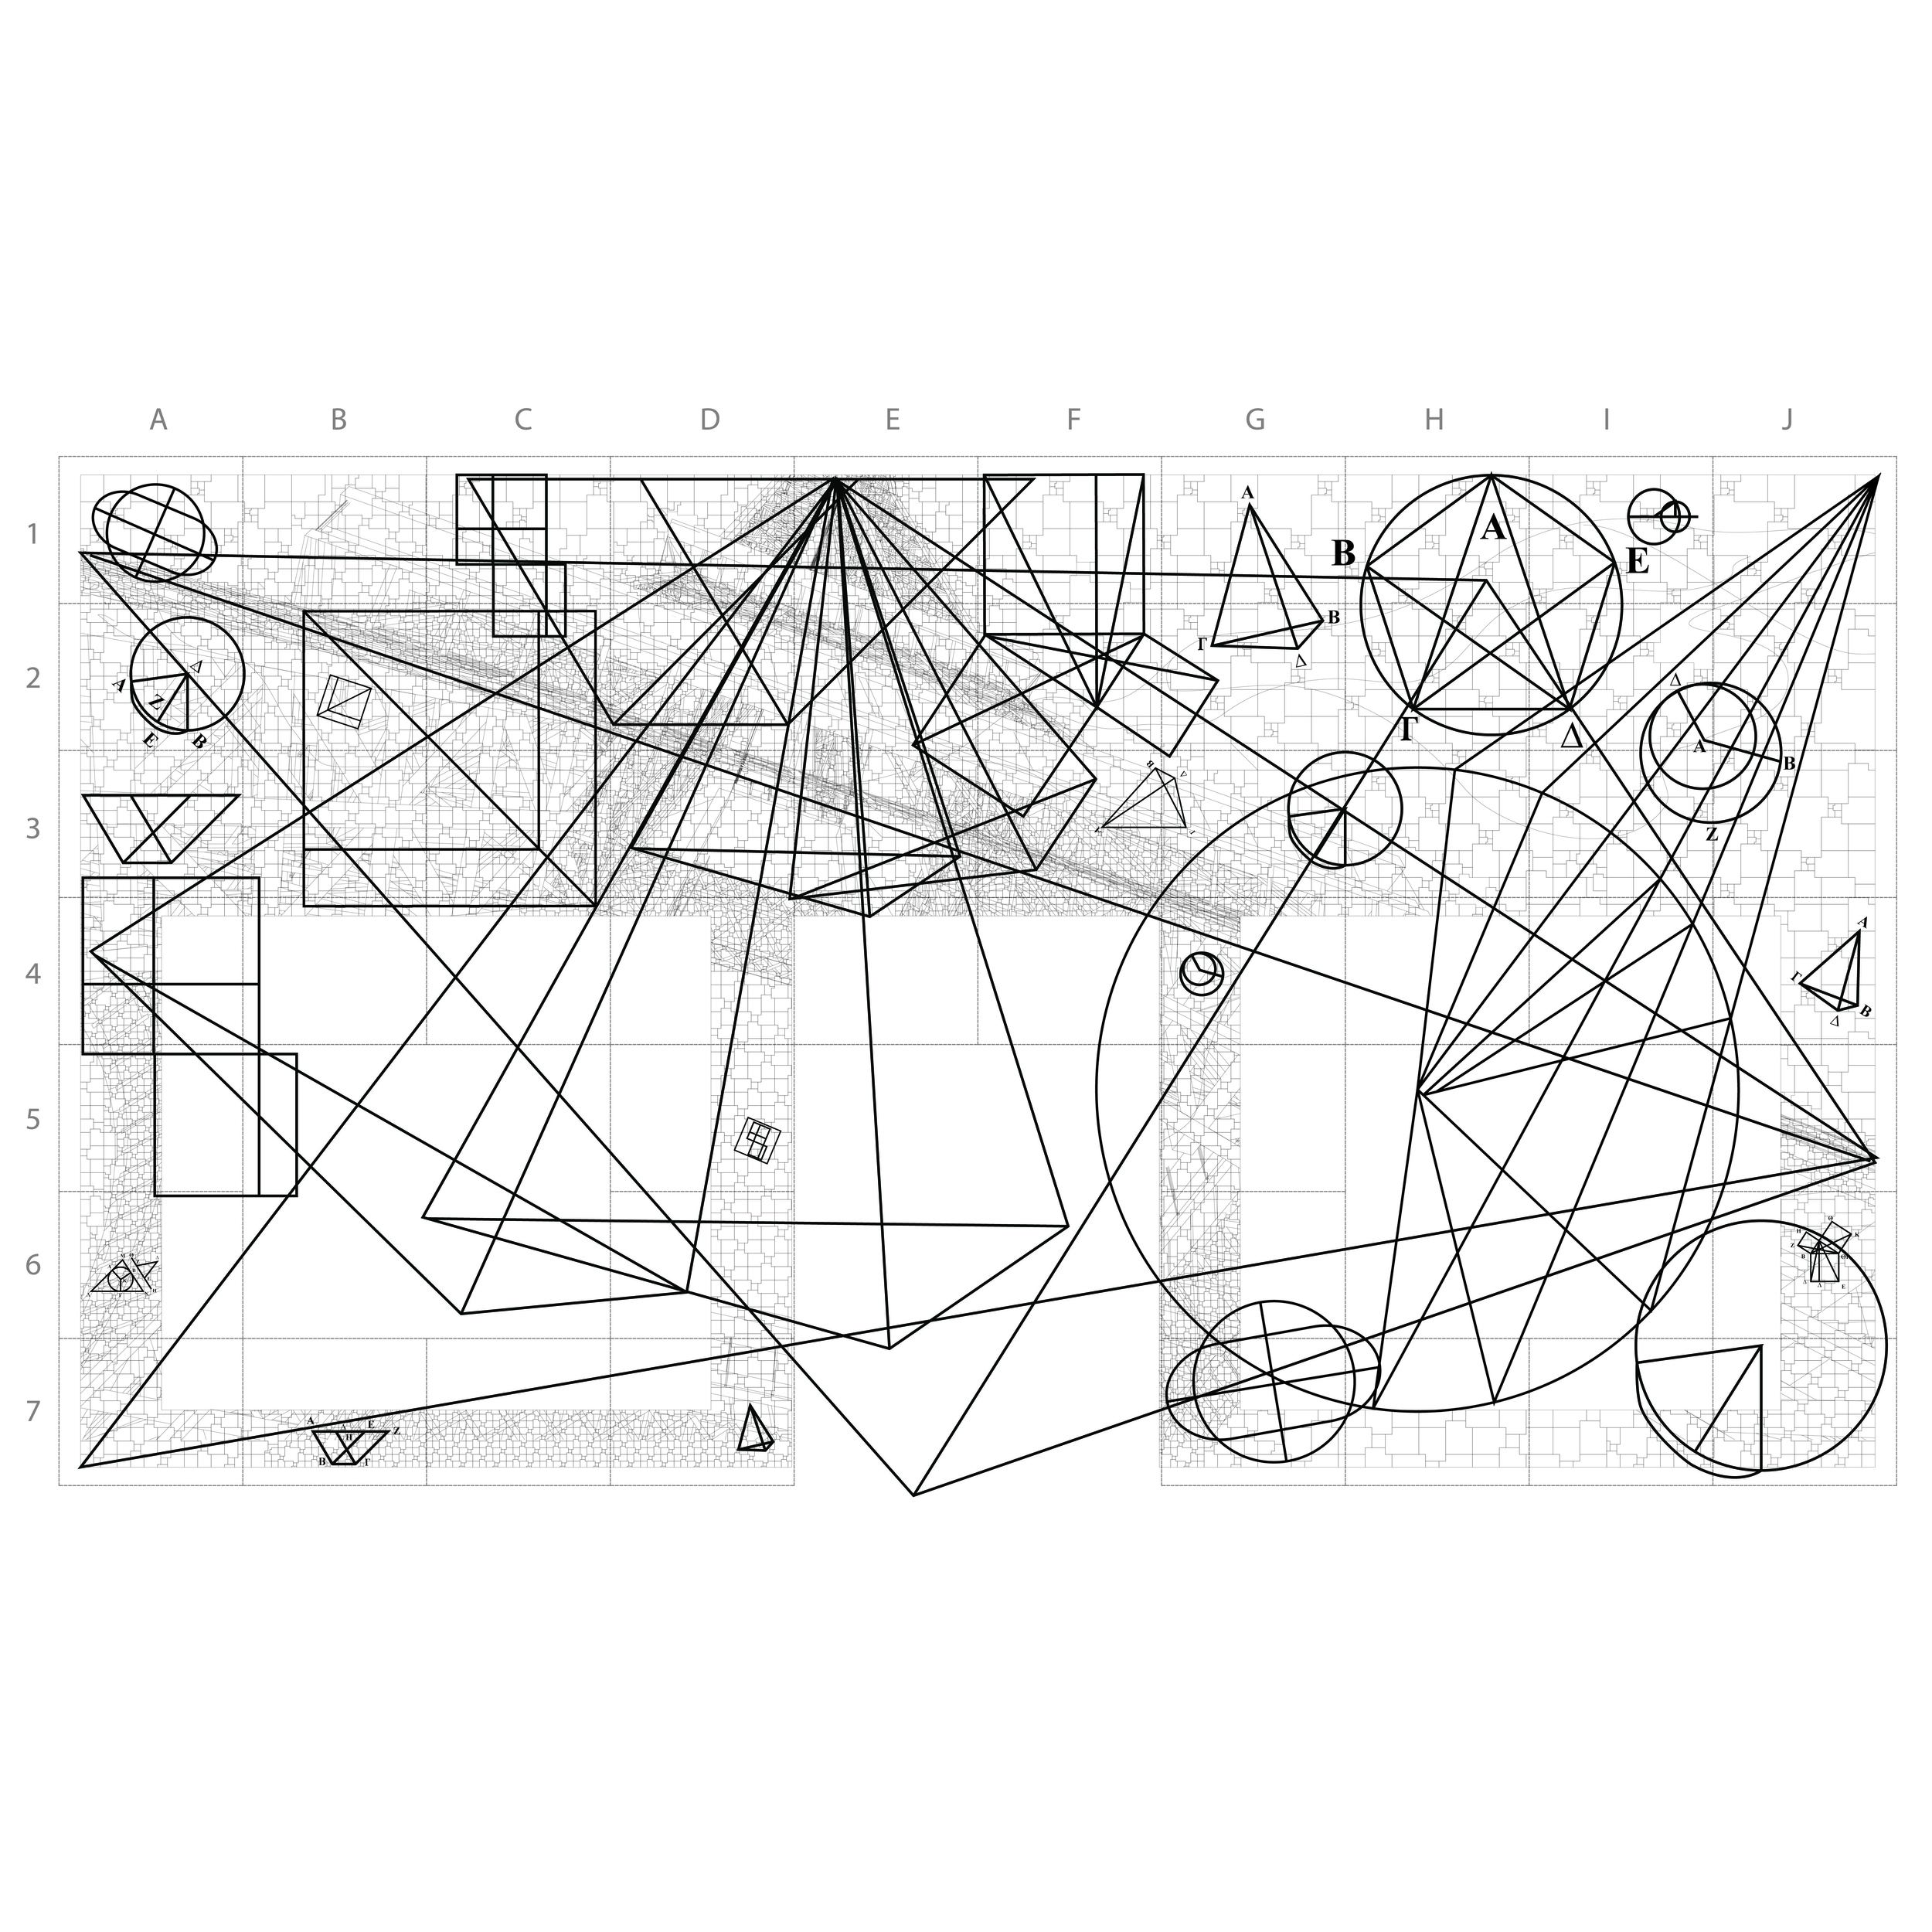 3-1107 KEY PLAN_EuclidSymbols7.jpg